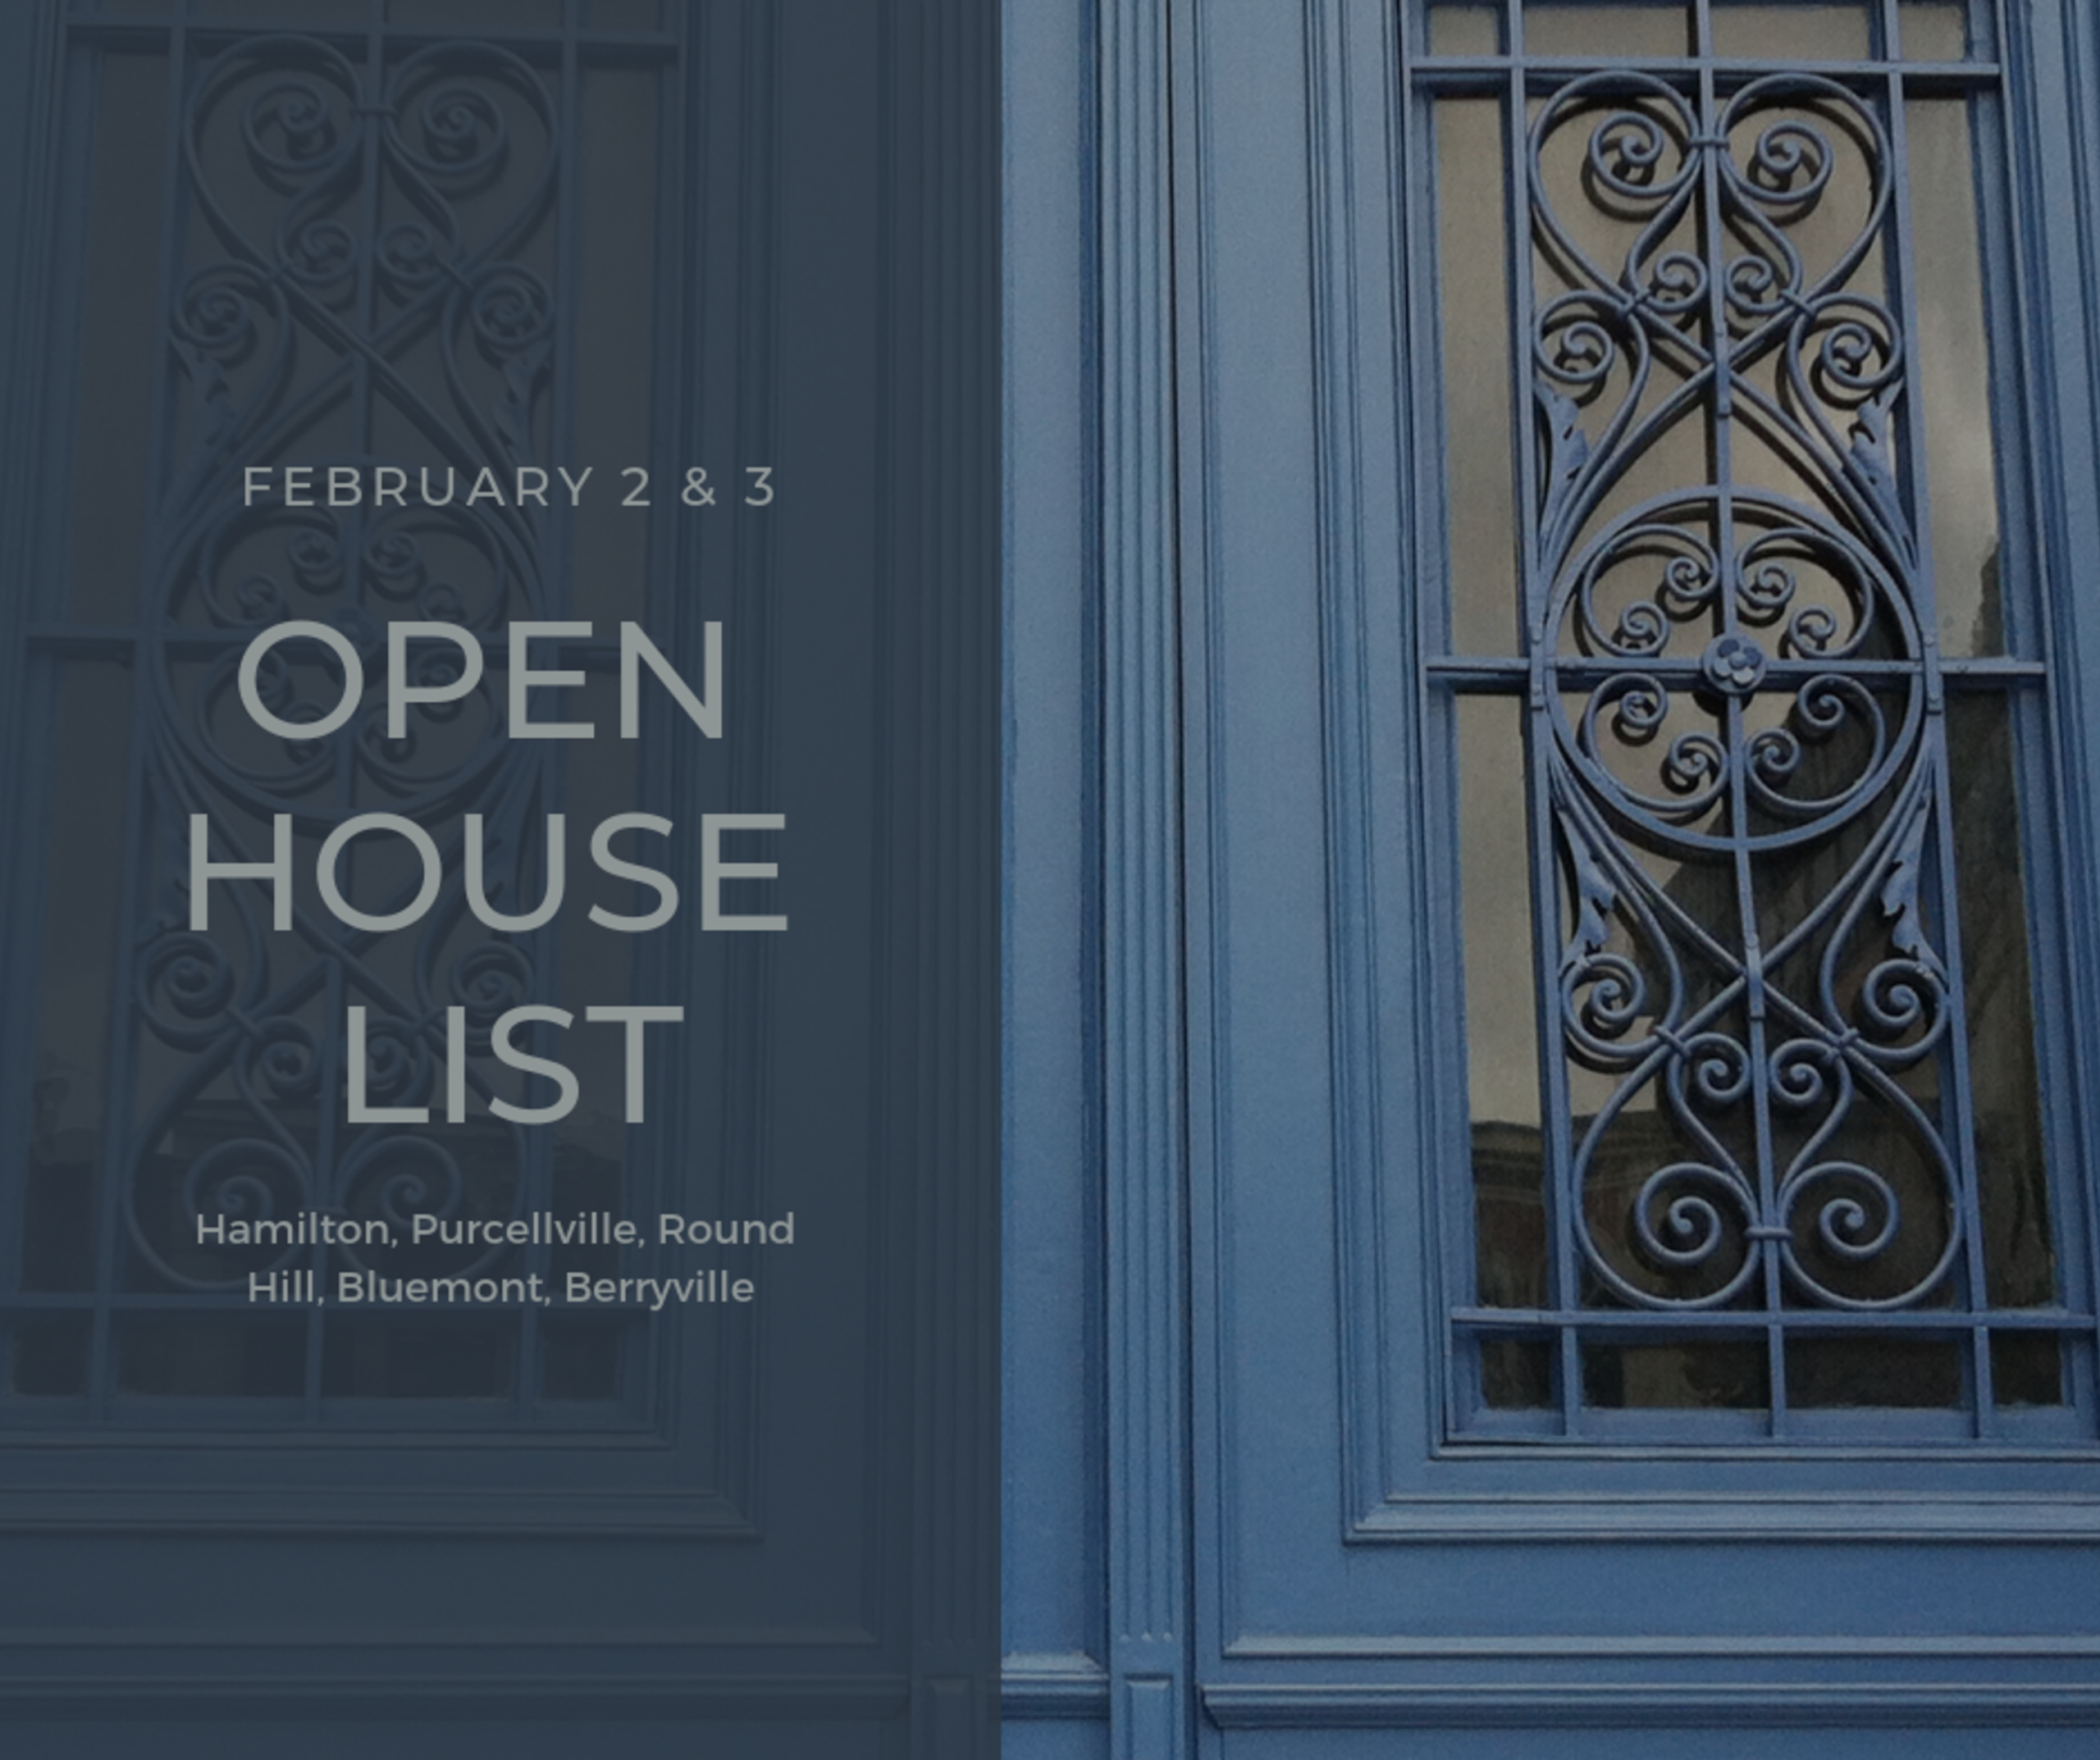 Open House List 2/2/19 – 2/3/19